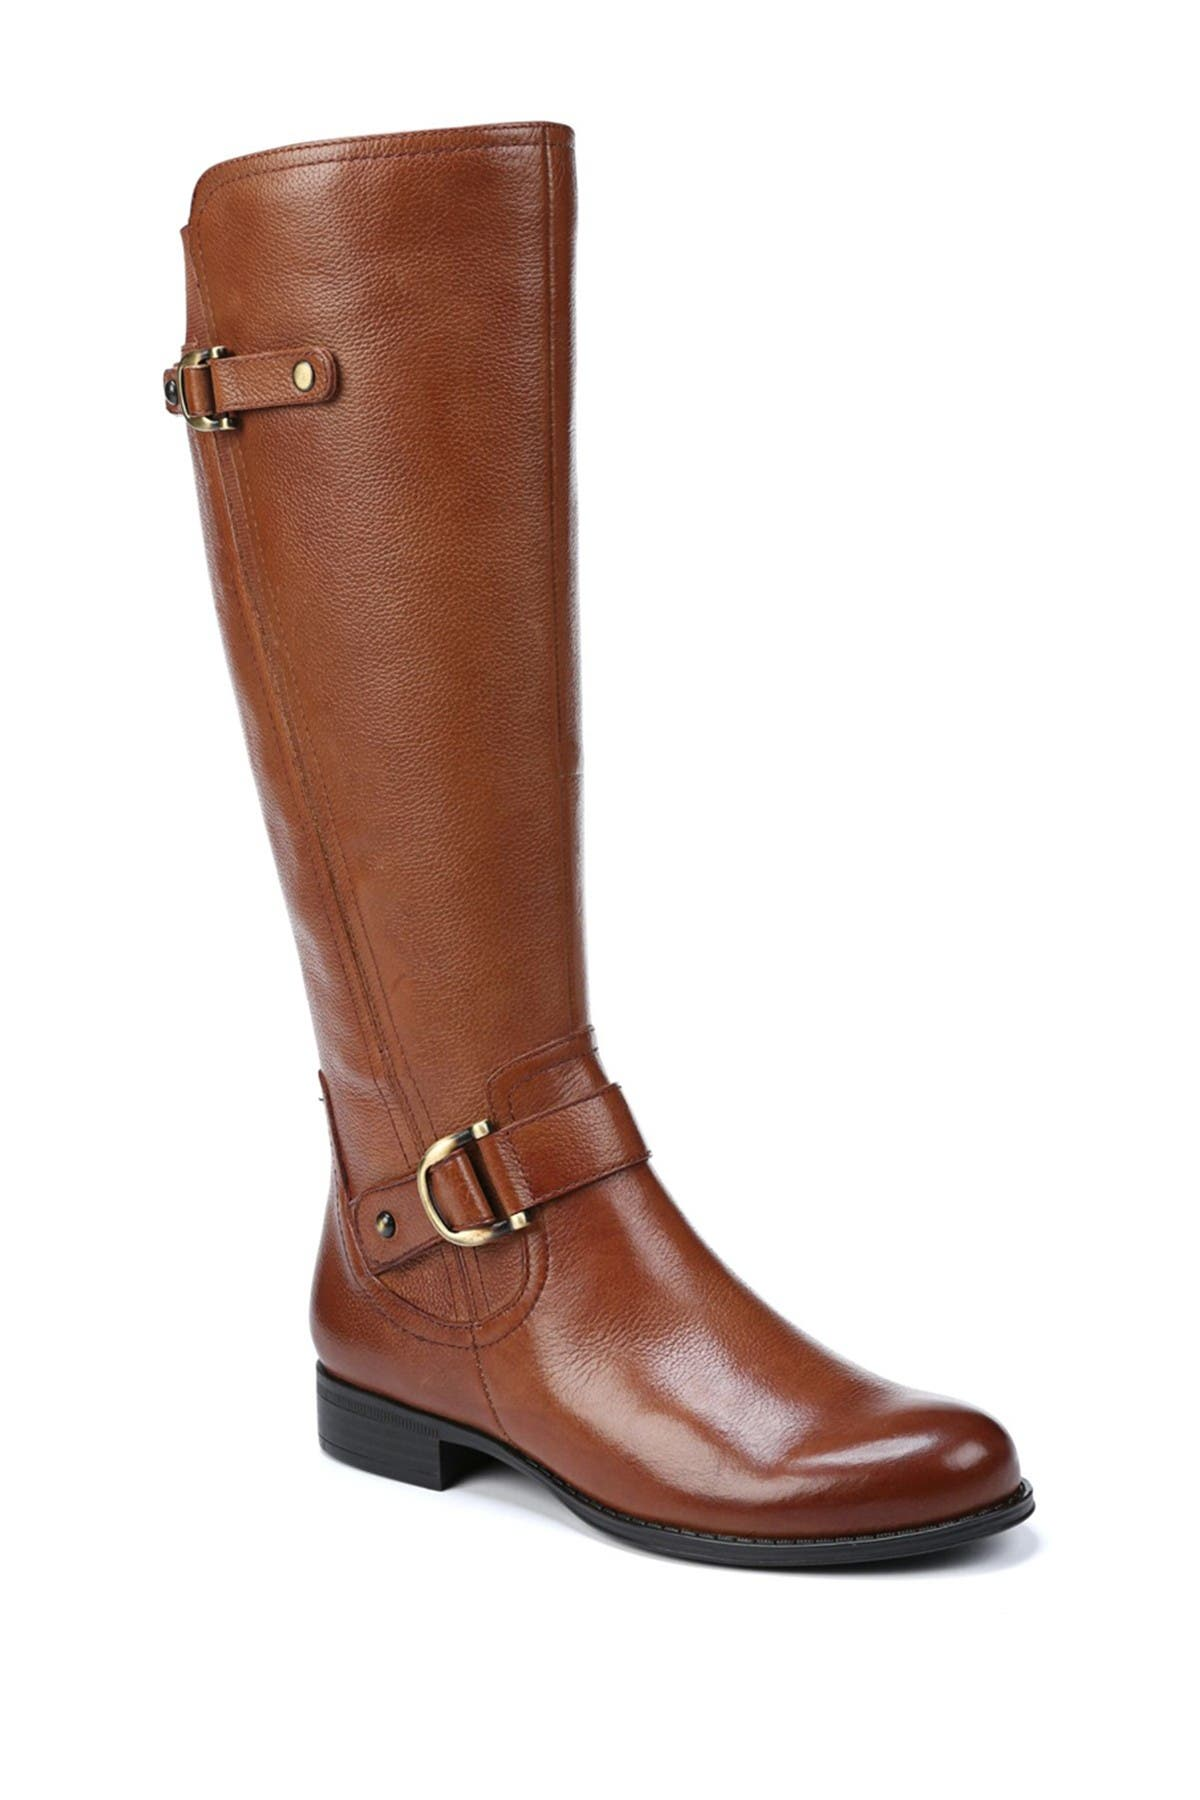 Naturalizer | Jillian Knee High Leather